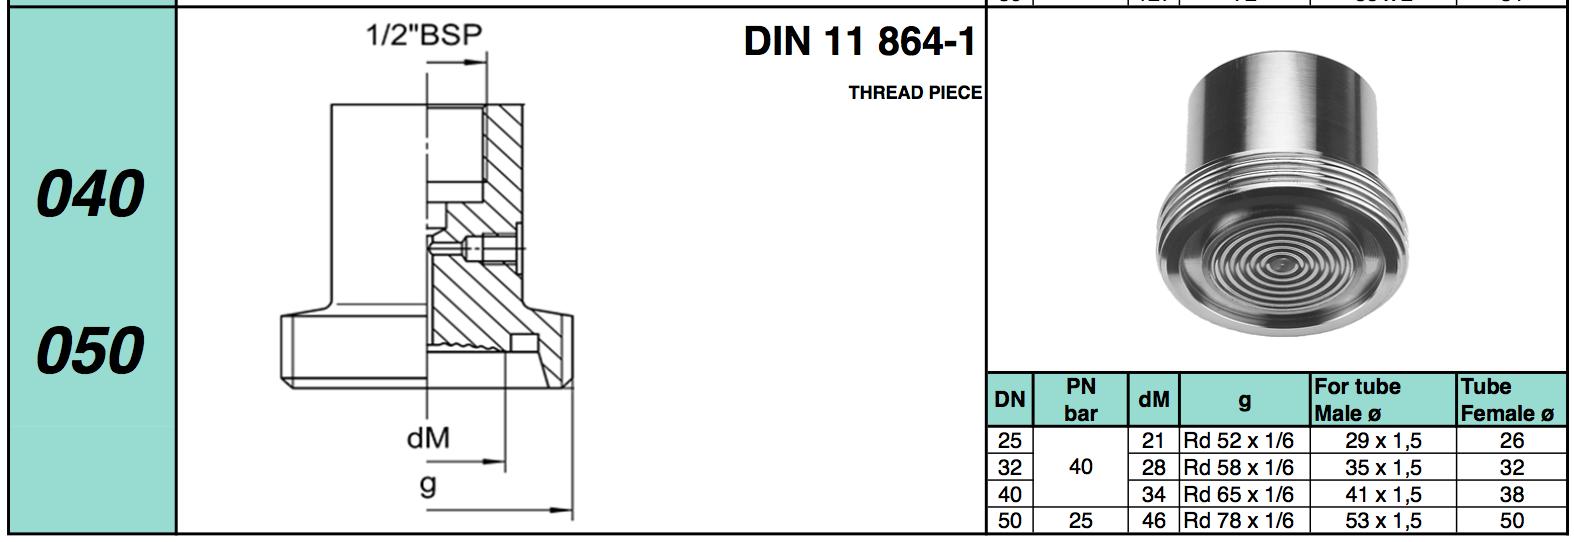 Chuẩn kết nối Diaphragm Seal dạng Thread Piece DIN 11 864-1